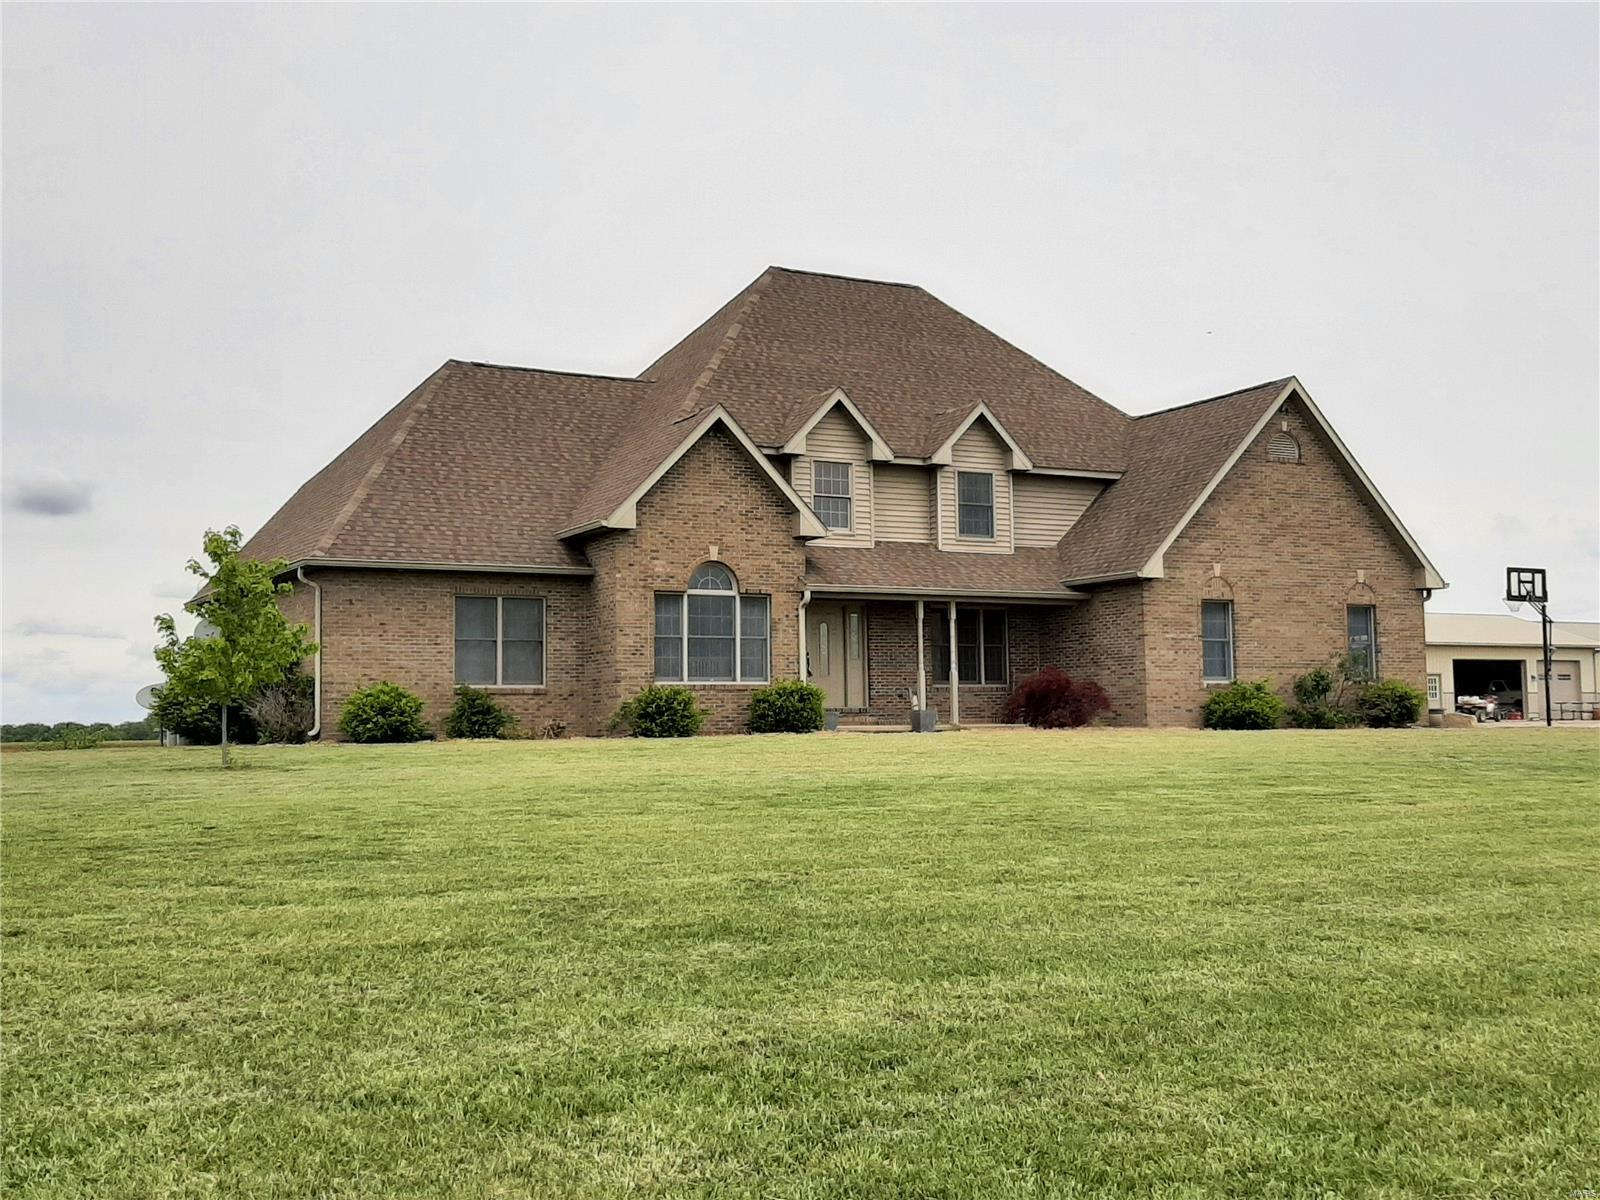 32615 Audrain Road 734 Property Photo - Martinsburg, MO real estate listing